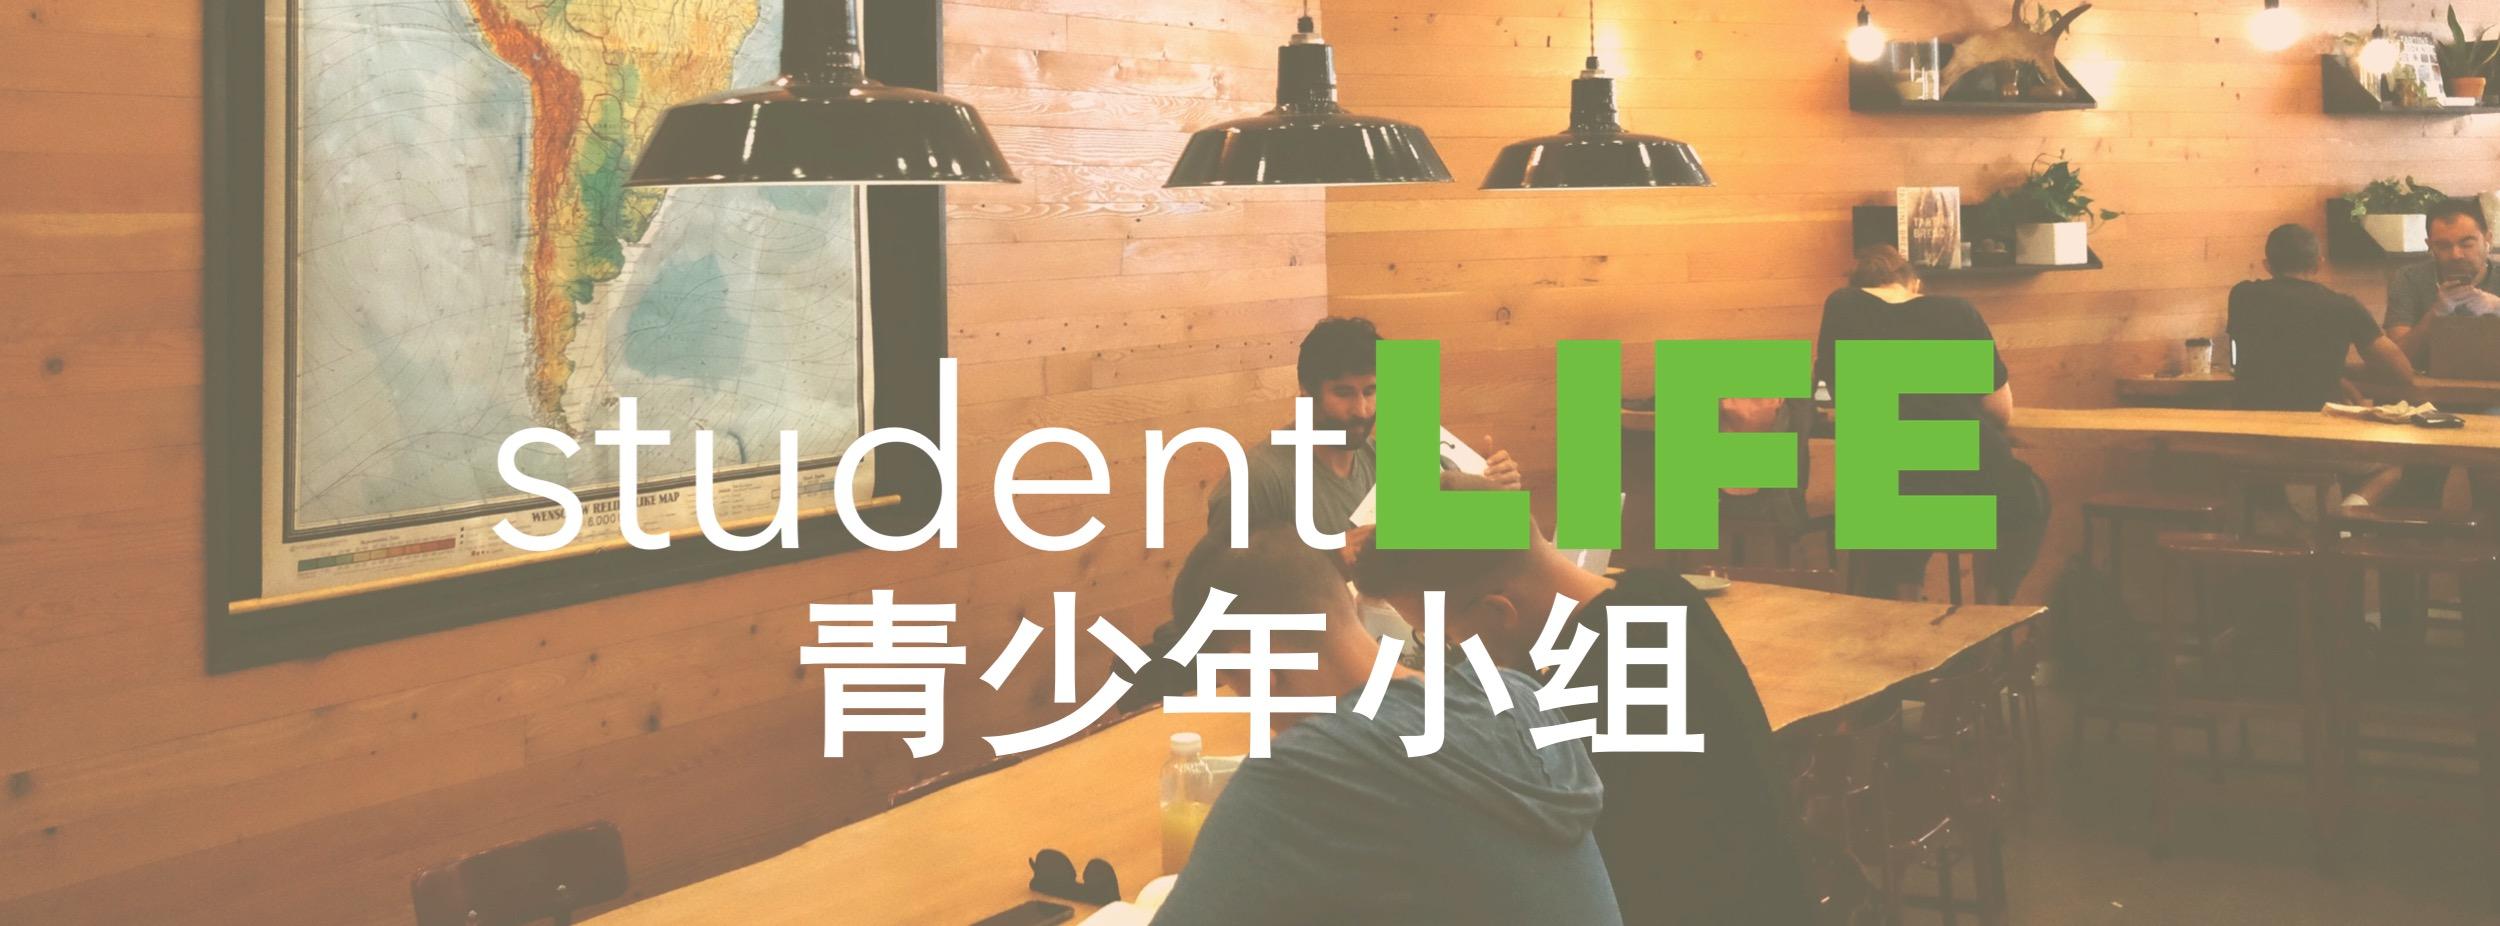 StudentLife - Chinese